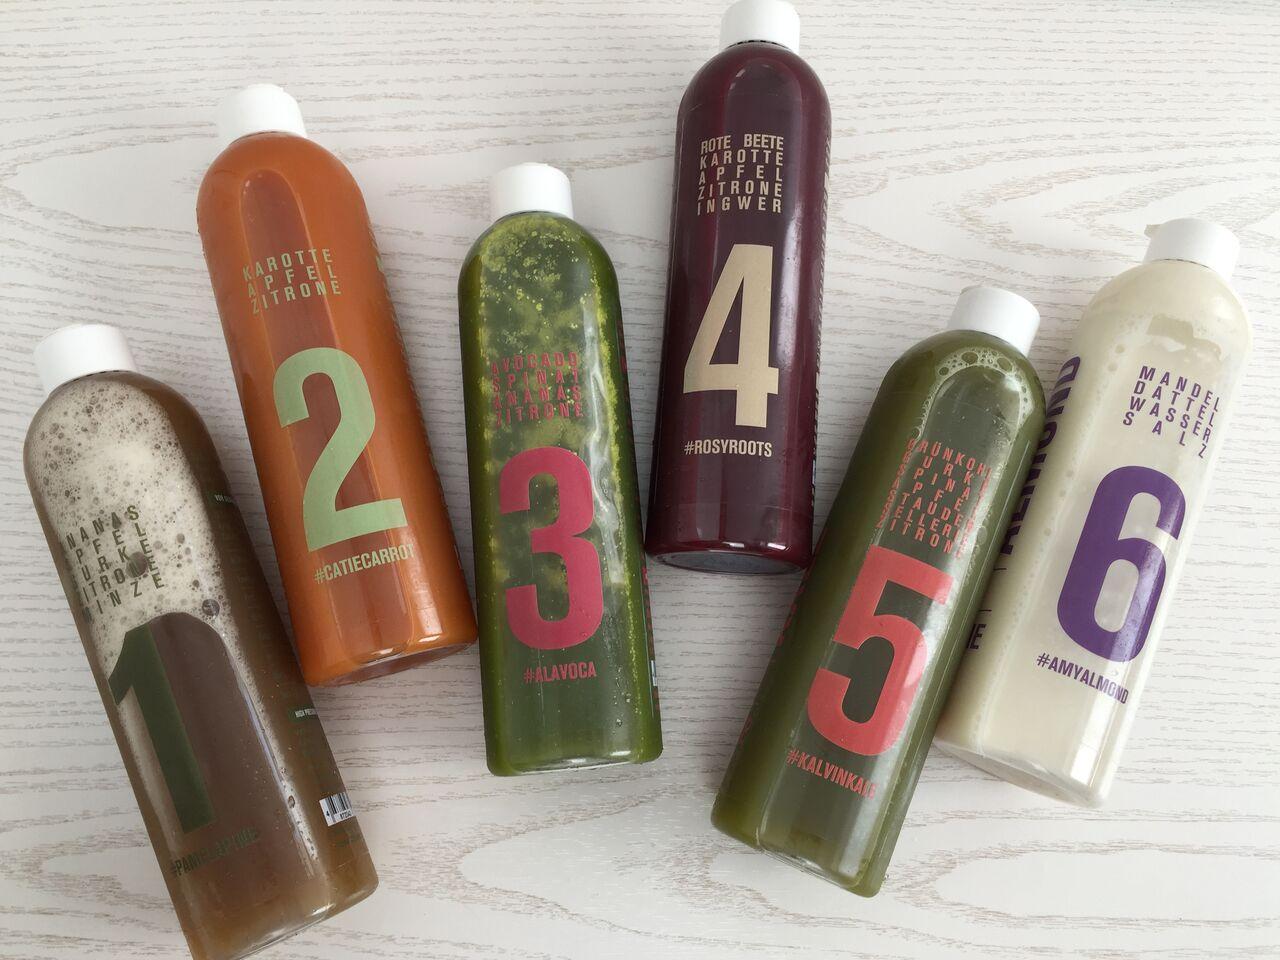 [Produkt] 3 Tage mit Kale&Me